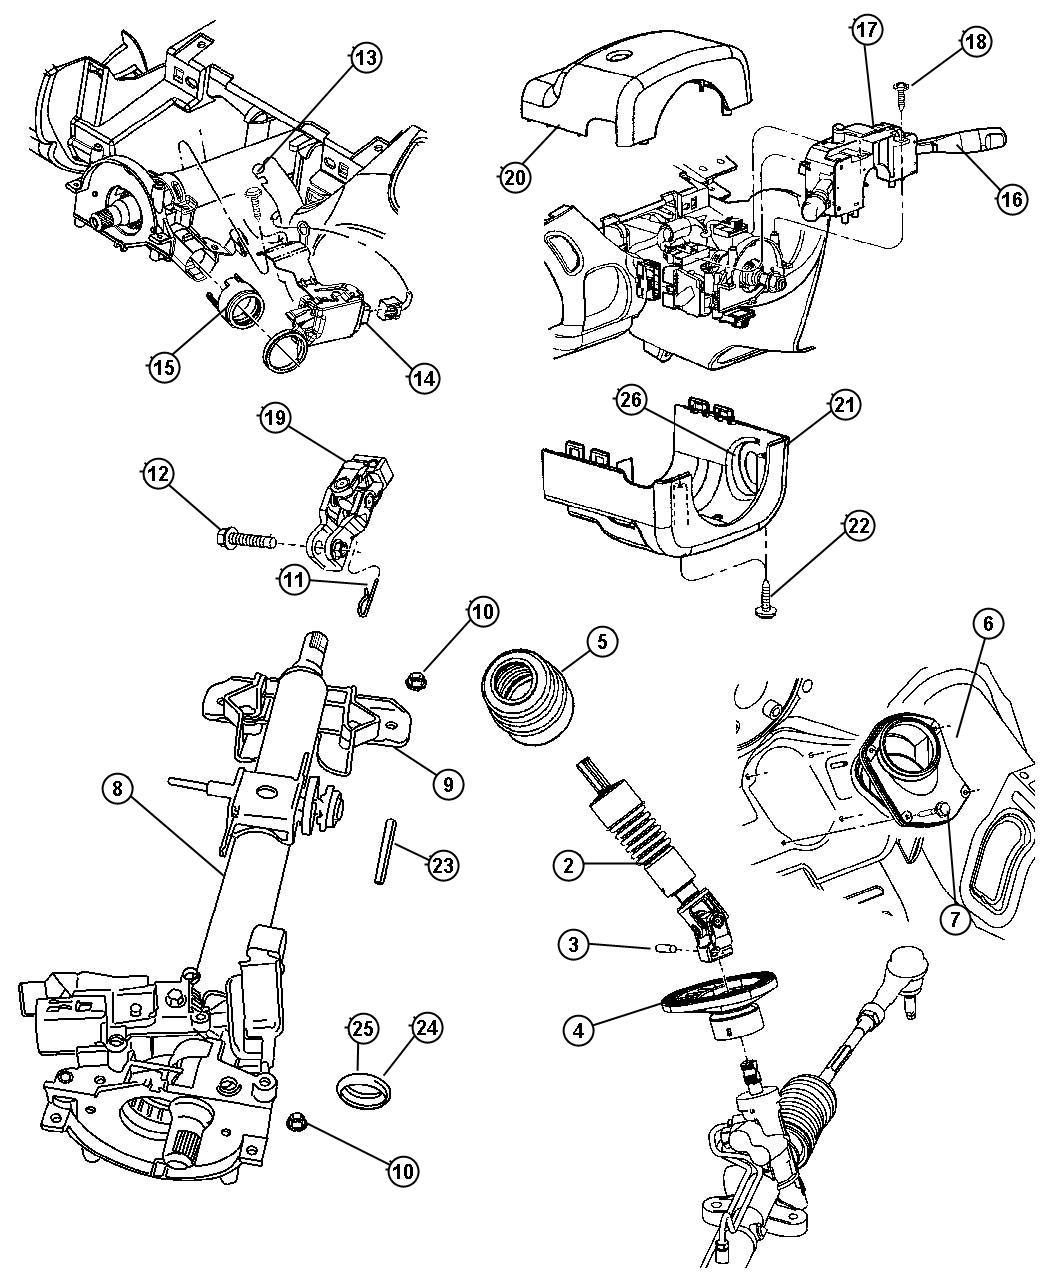 Chrysler Sebring Clamp. Lock housing. Automatic